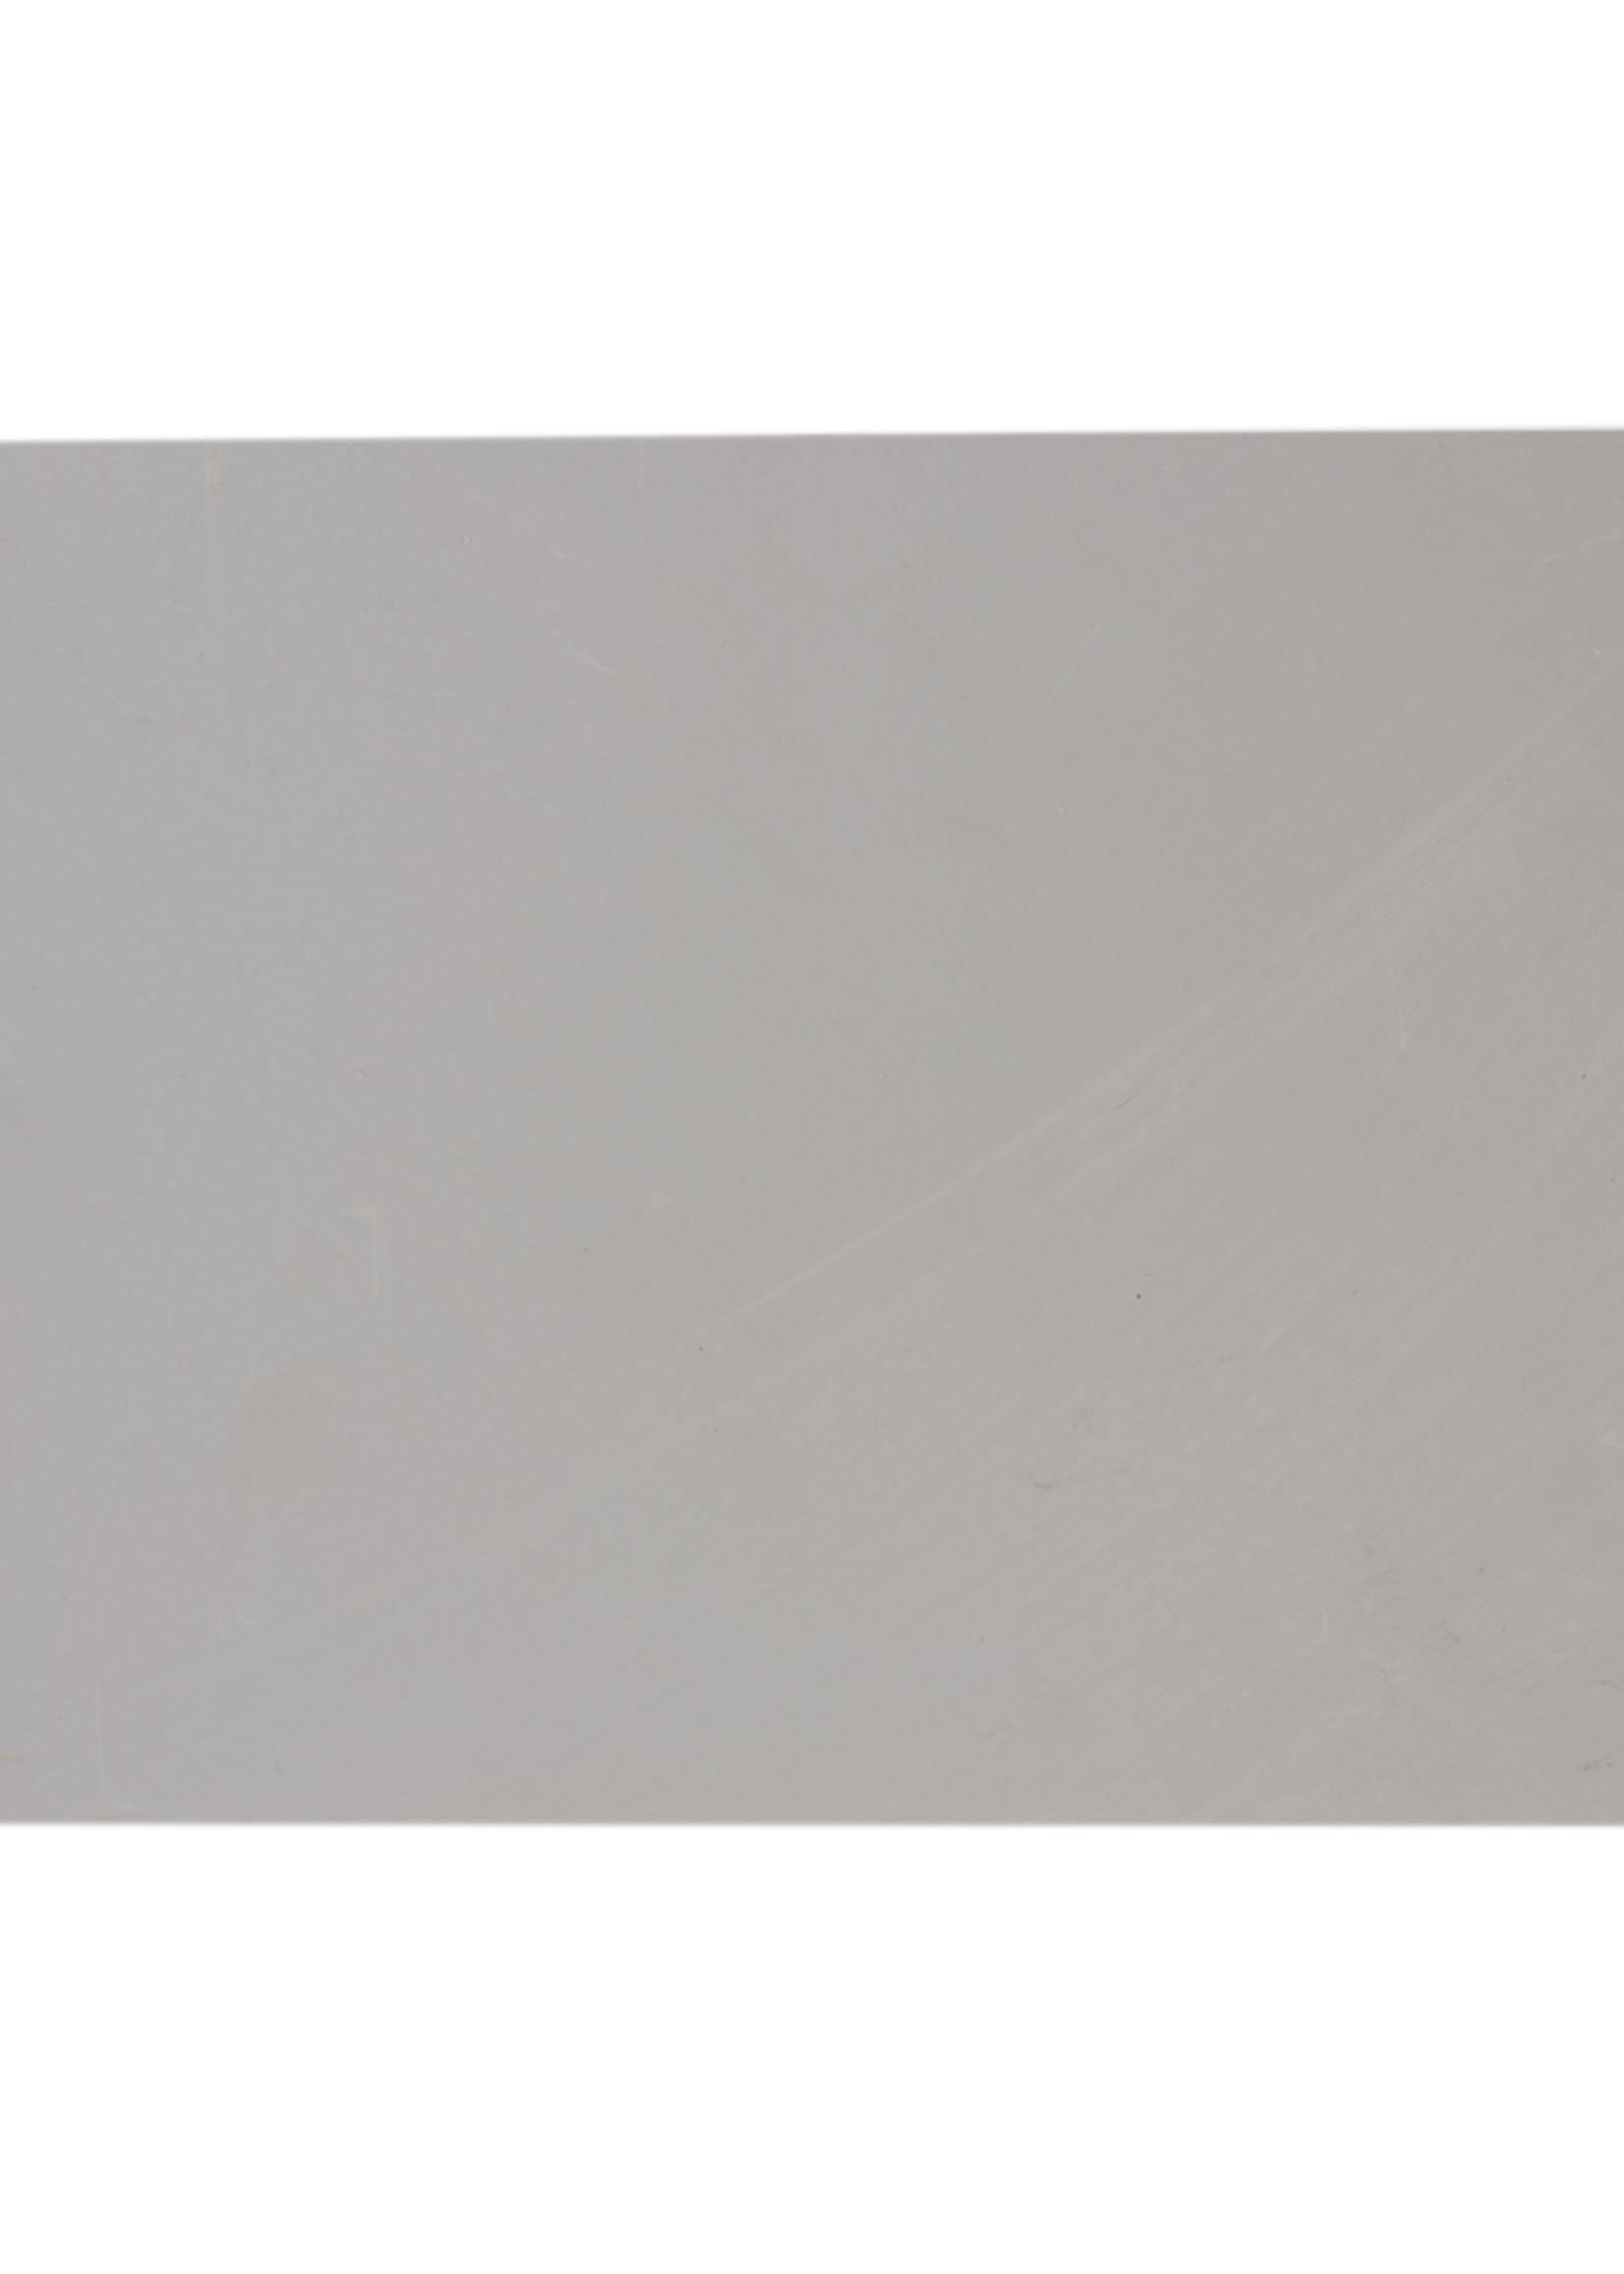 SPEEDBALL ART PRODUCTS RED BARON GRAY LINO BLOCK